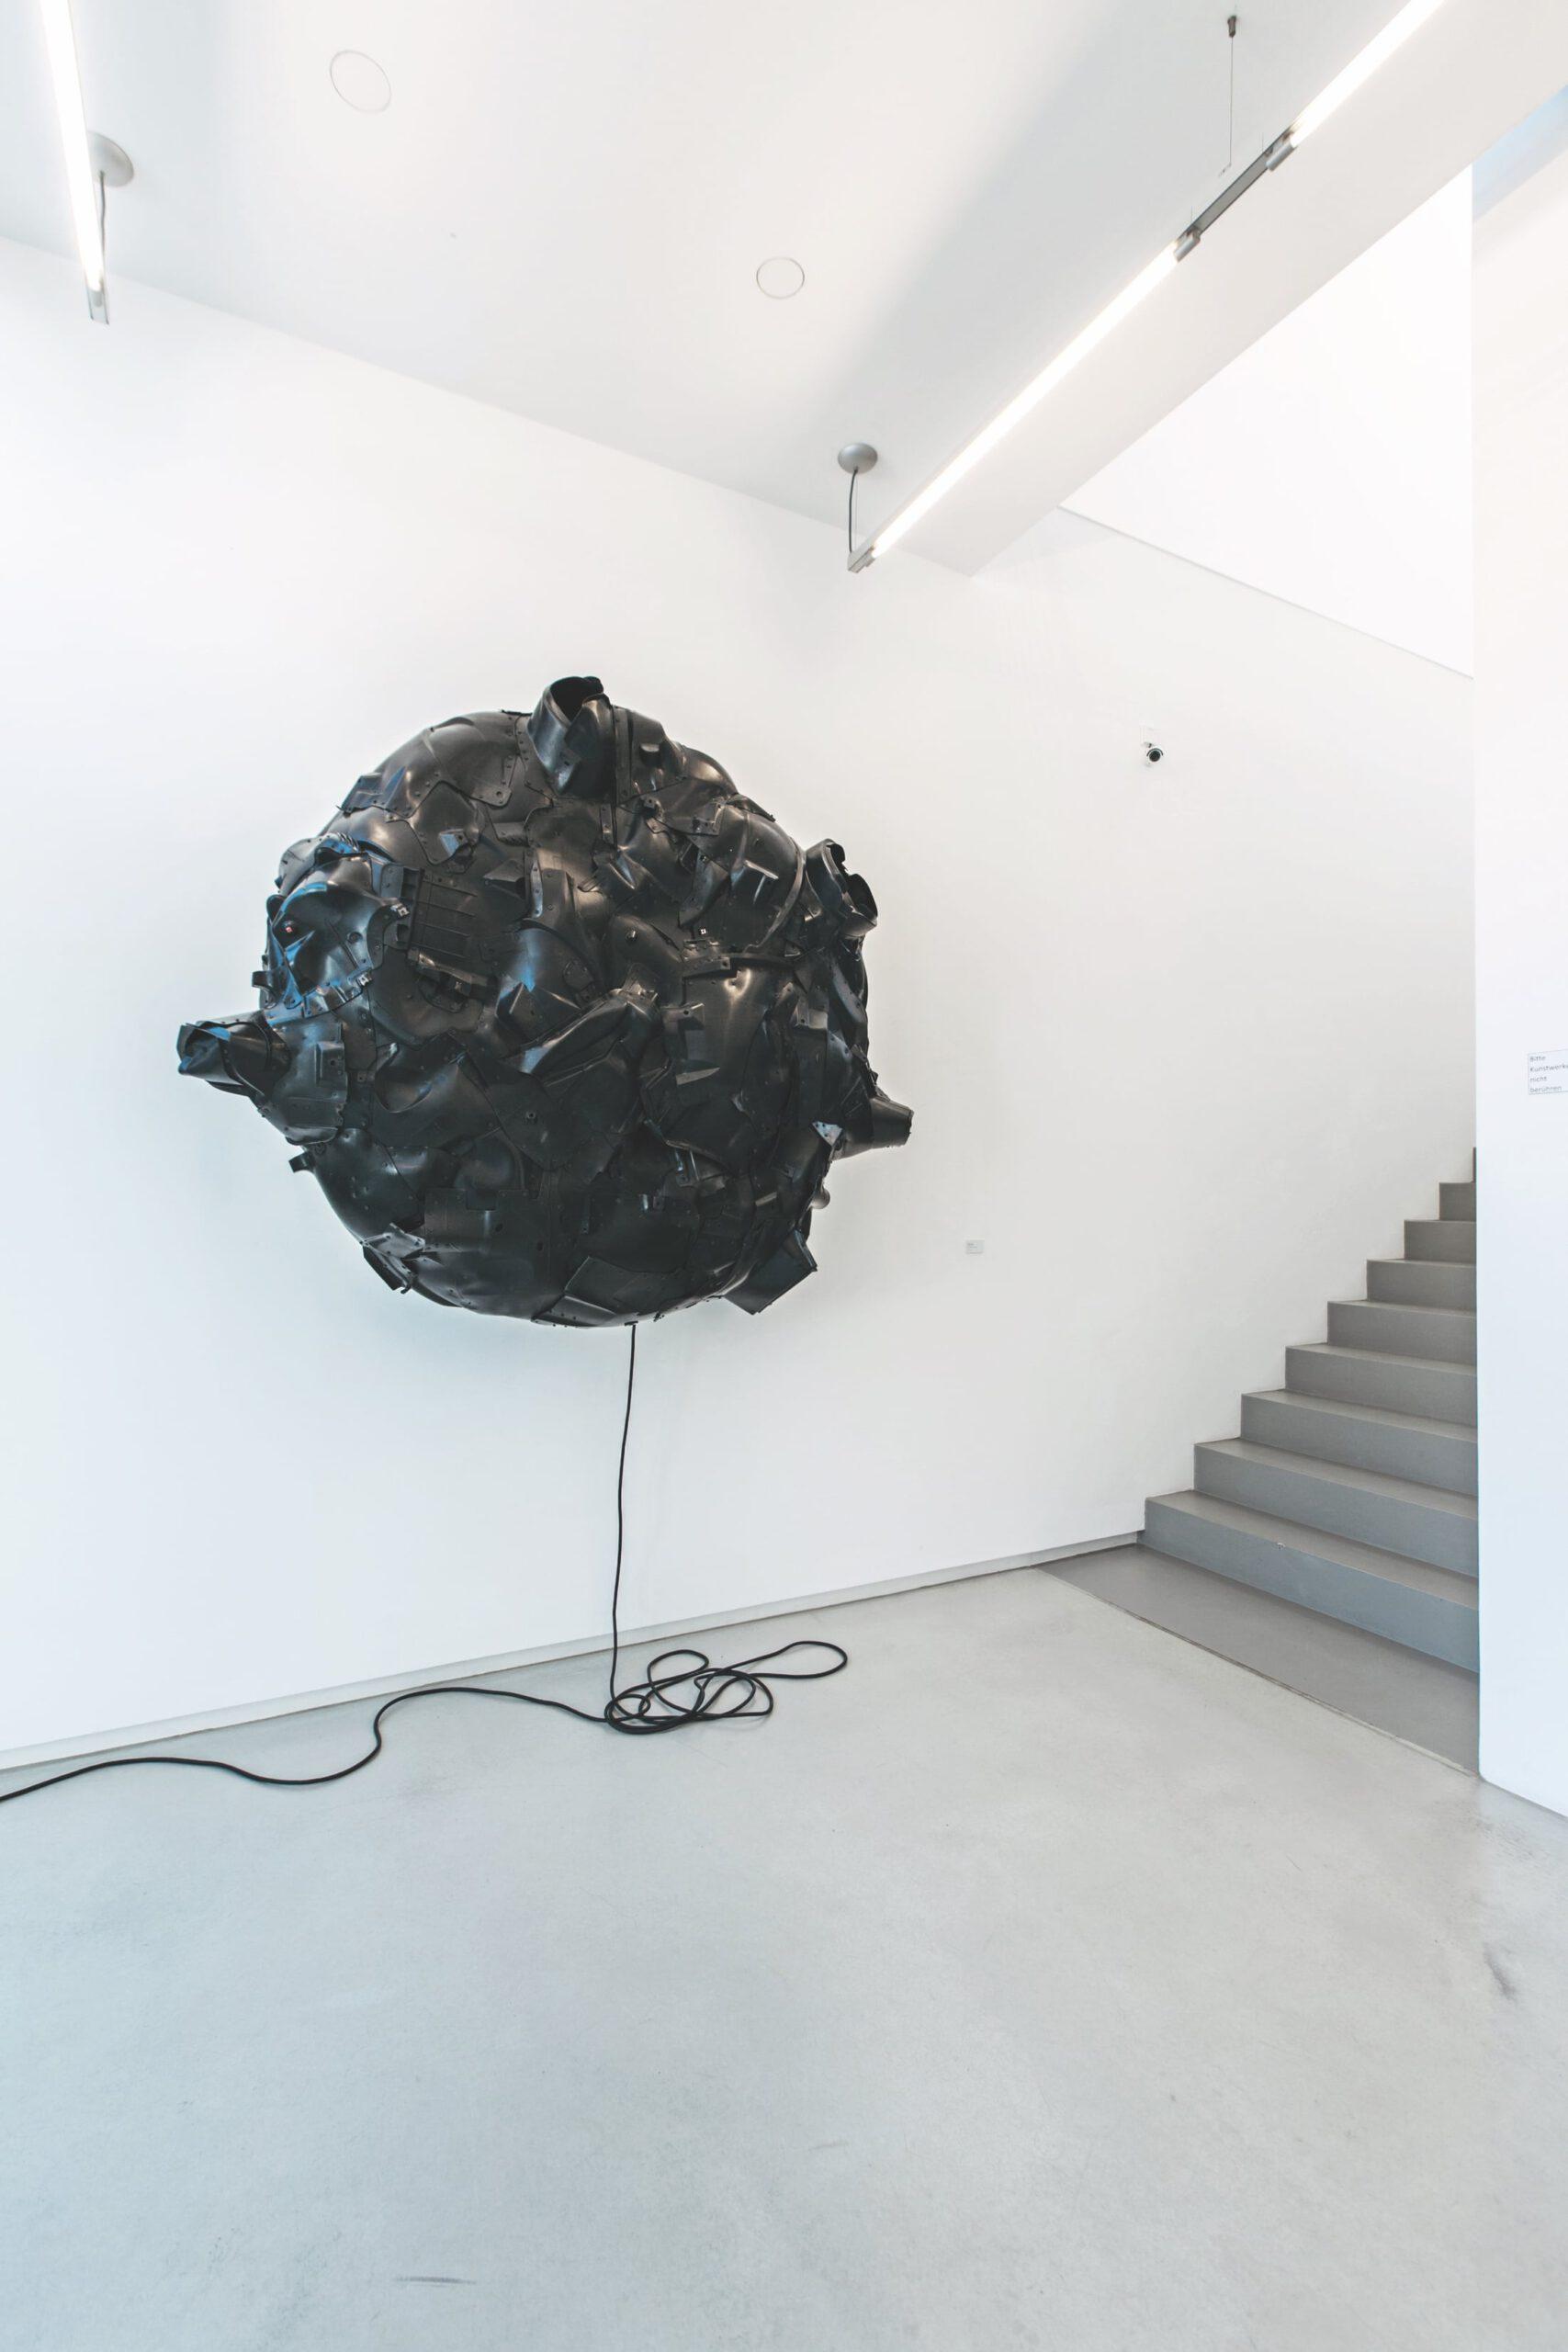 06-urban-hueter-entity-black-crust-2015-kunststoff-holz-aluminium-160-x-165-x-48-cm